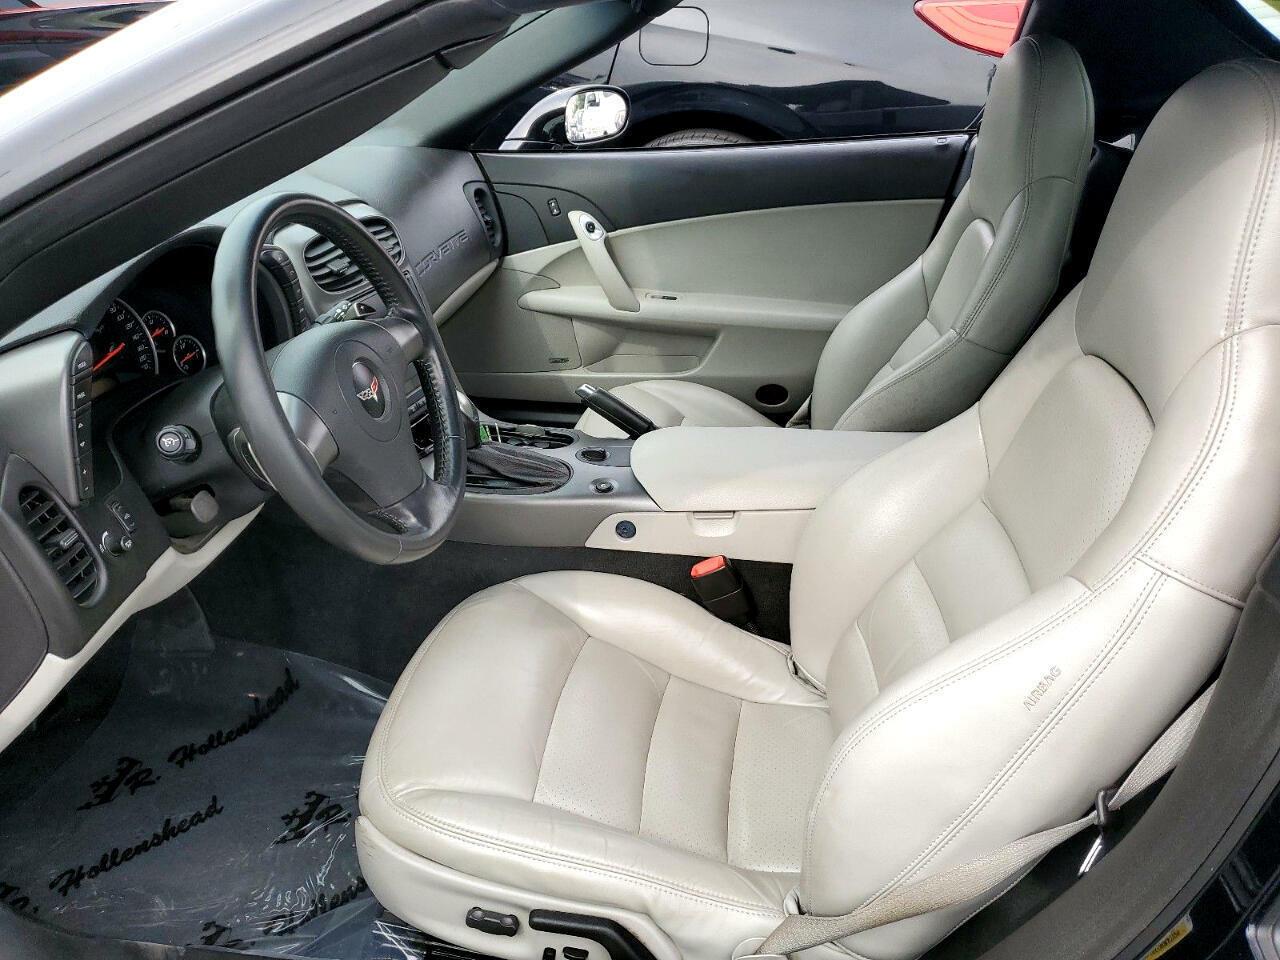 2006 Black Chevrolet Corvette Convertible  | C6 Corvette Photo 7